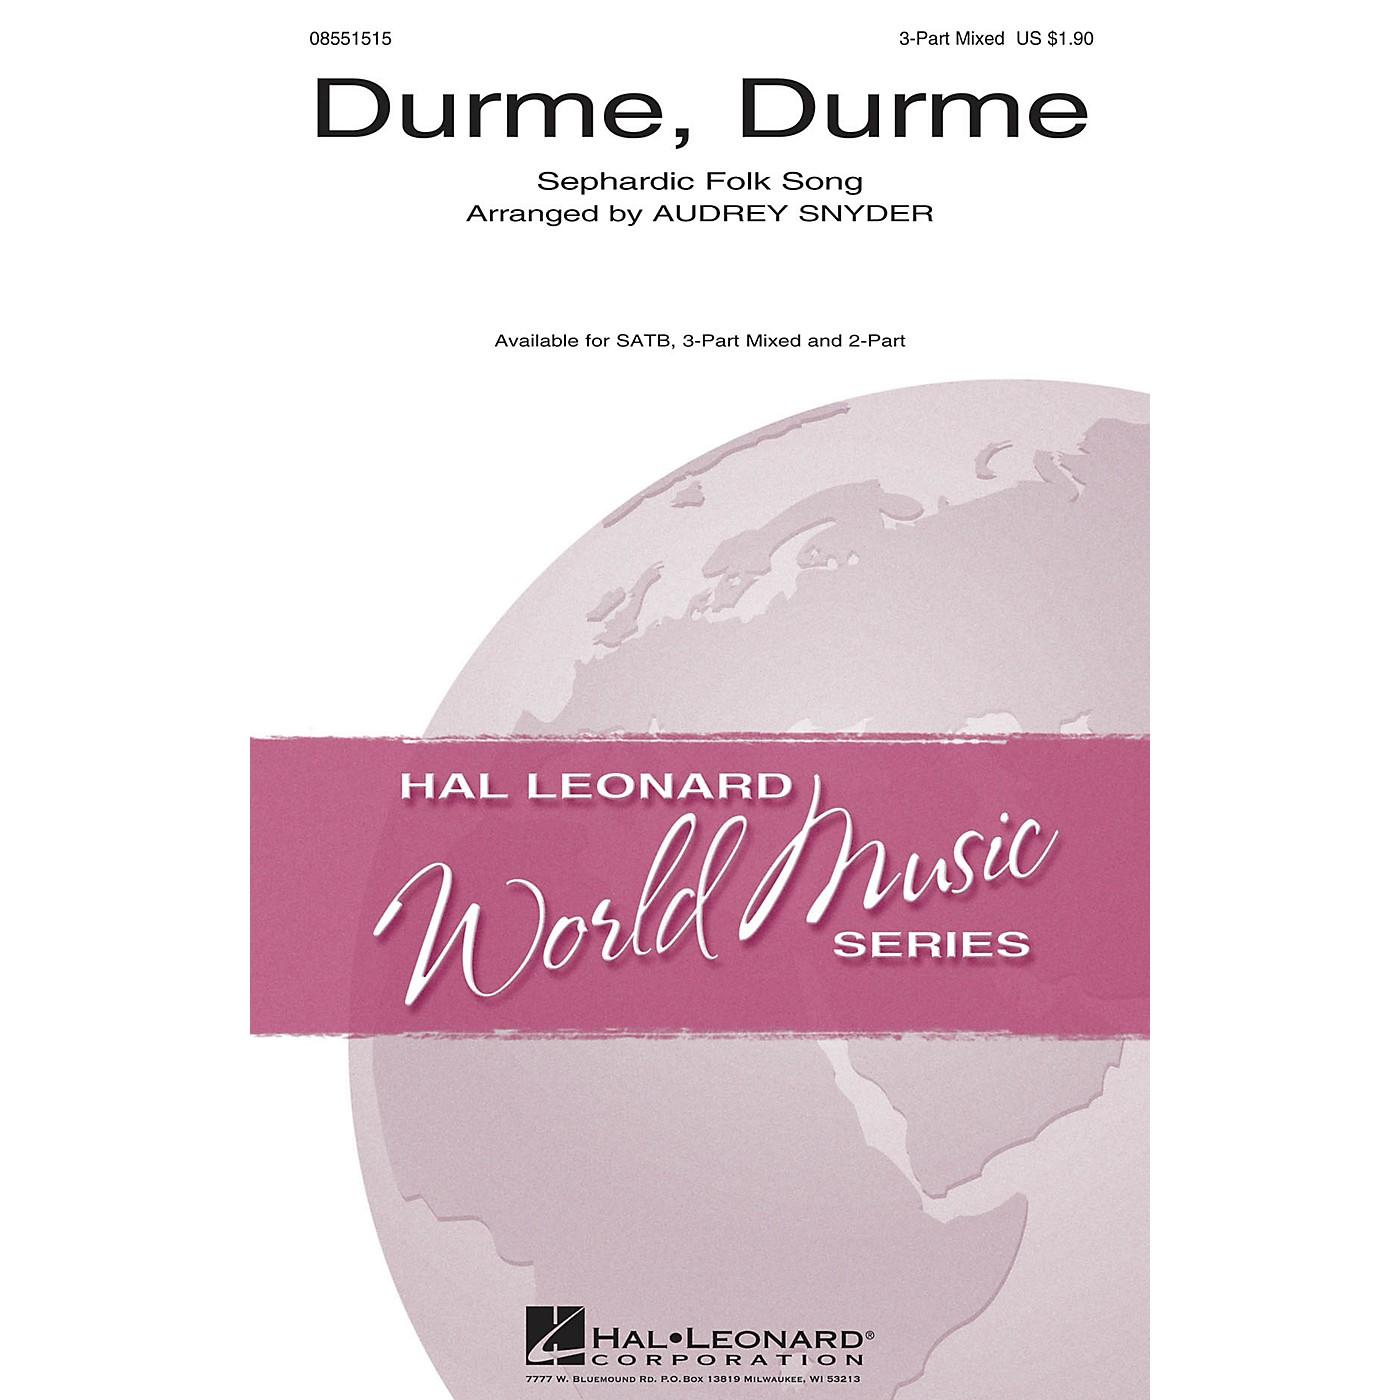 Hal Leonard Durme, Durme 3-Part Mixed arranged by Audrey Snyder thumbnail